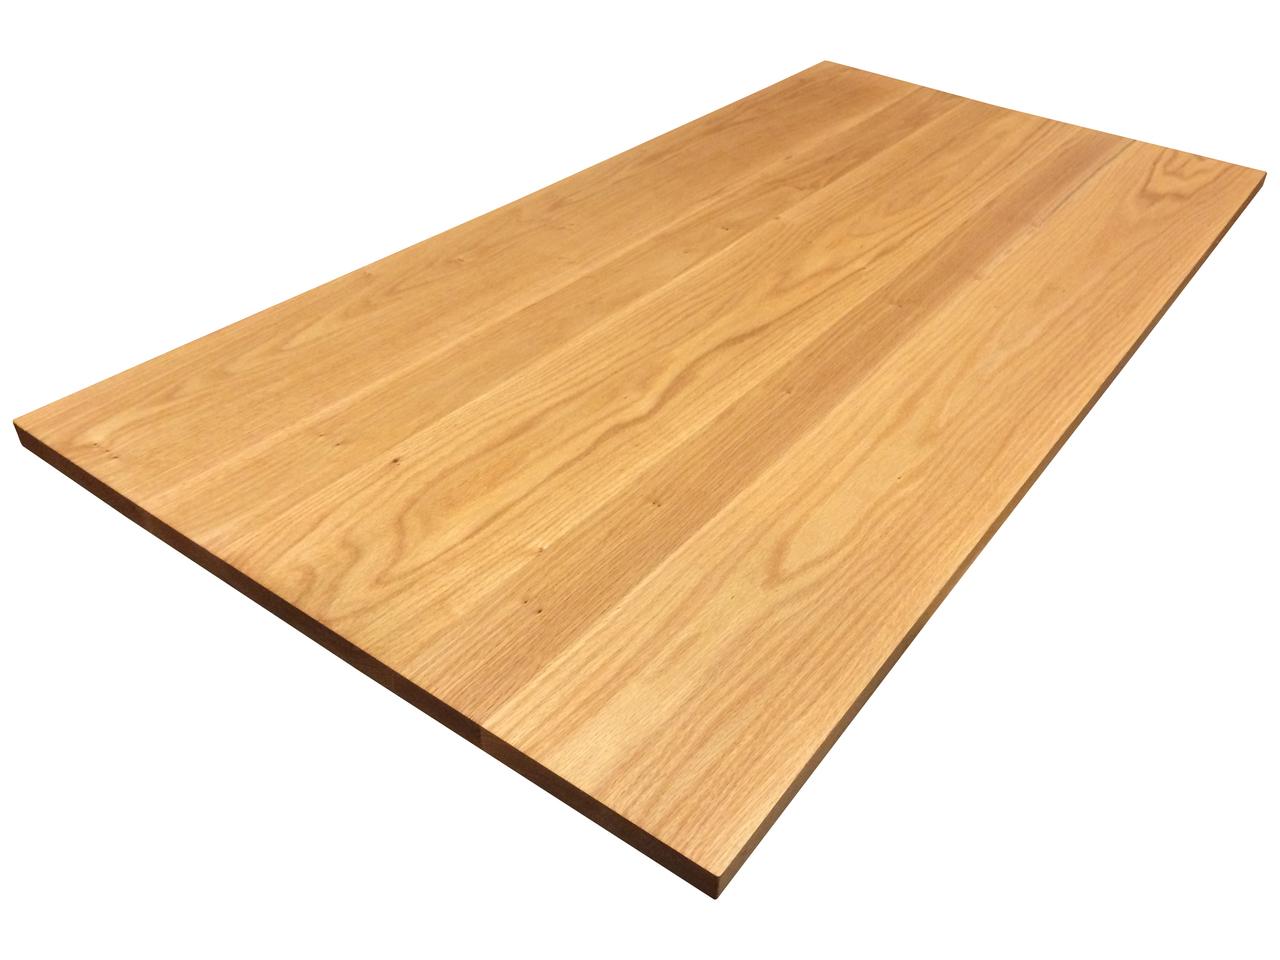 Armani Fine Woodworking Red Oak Tabletop